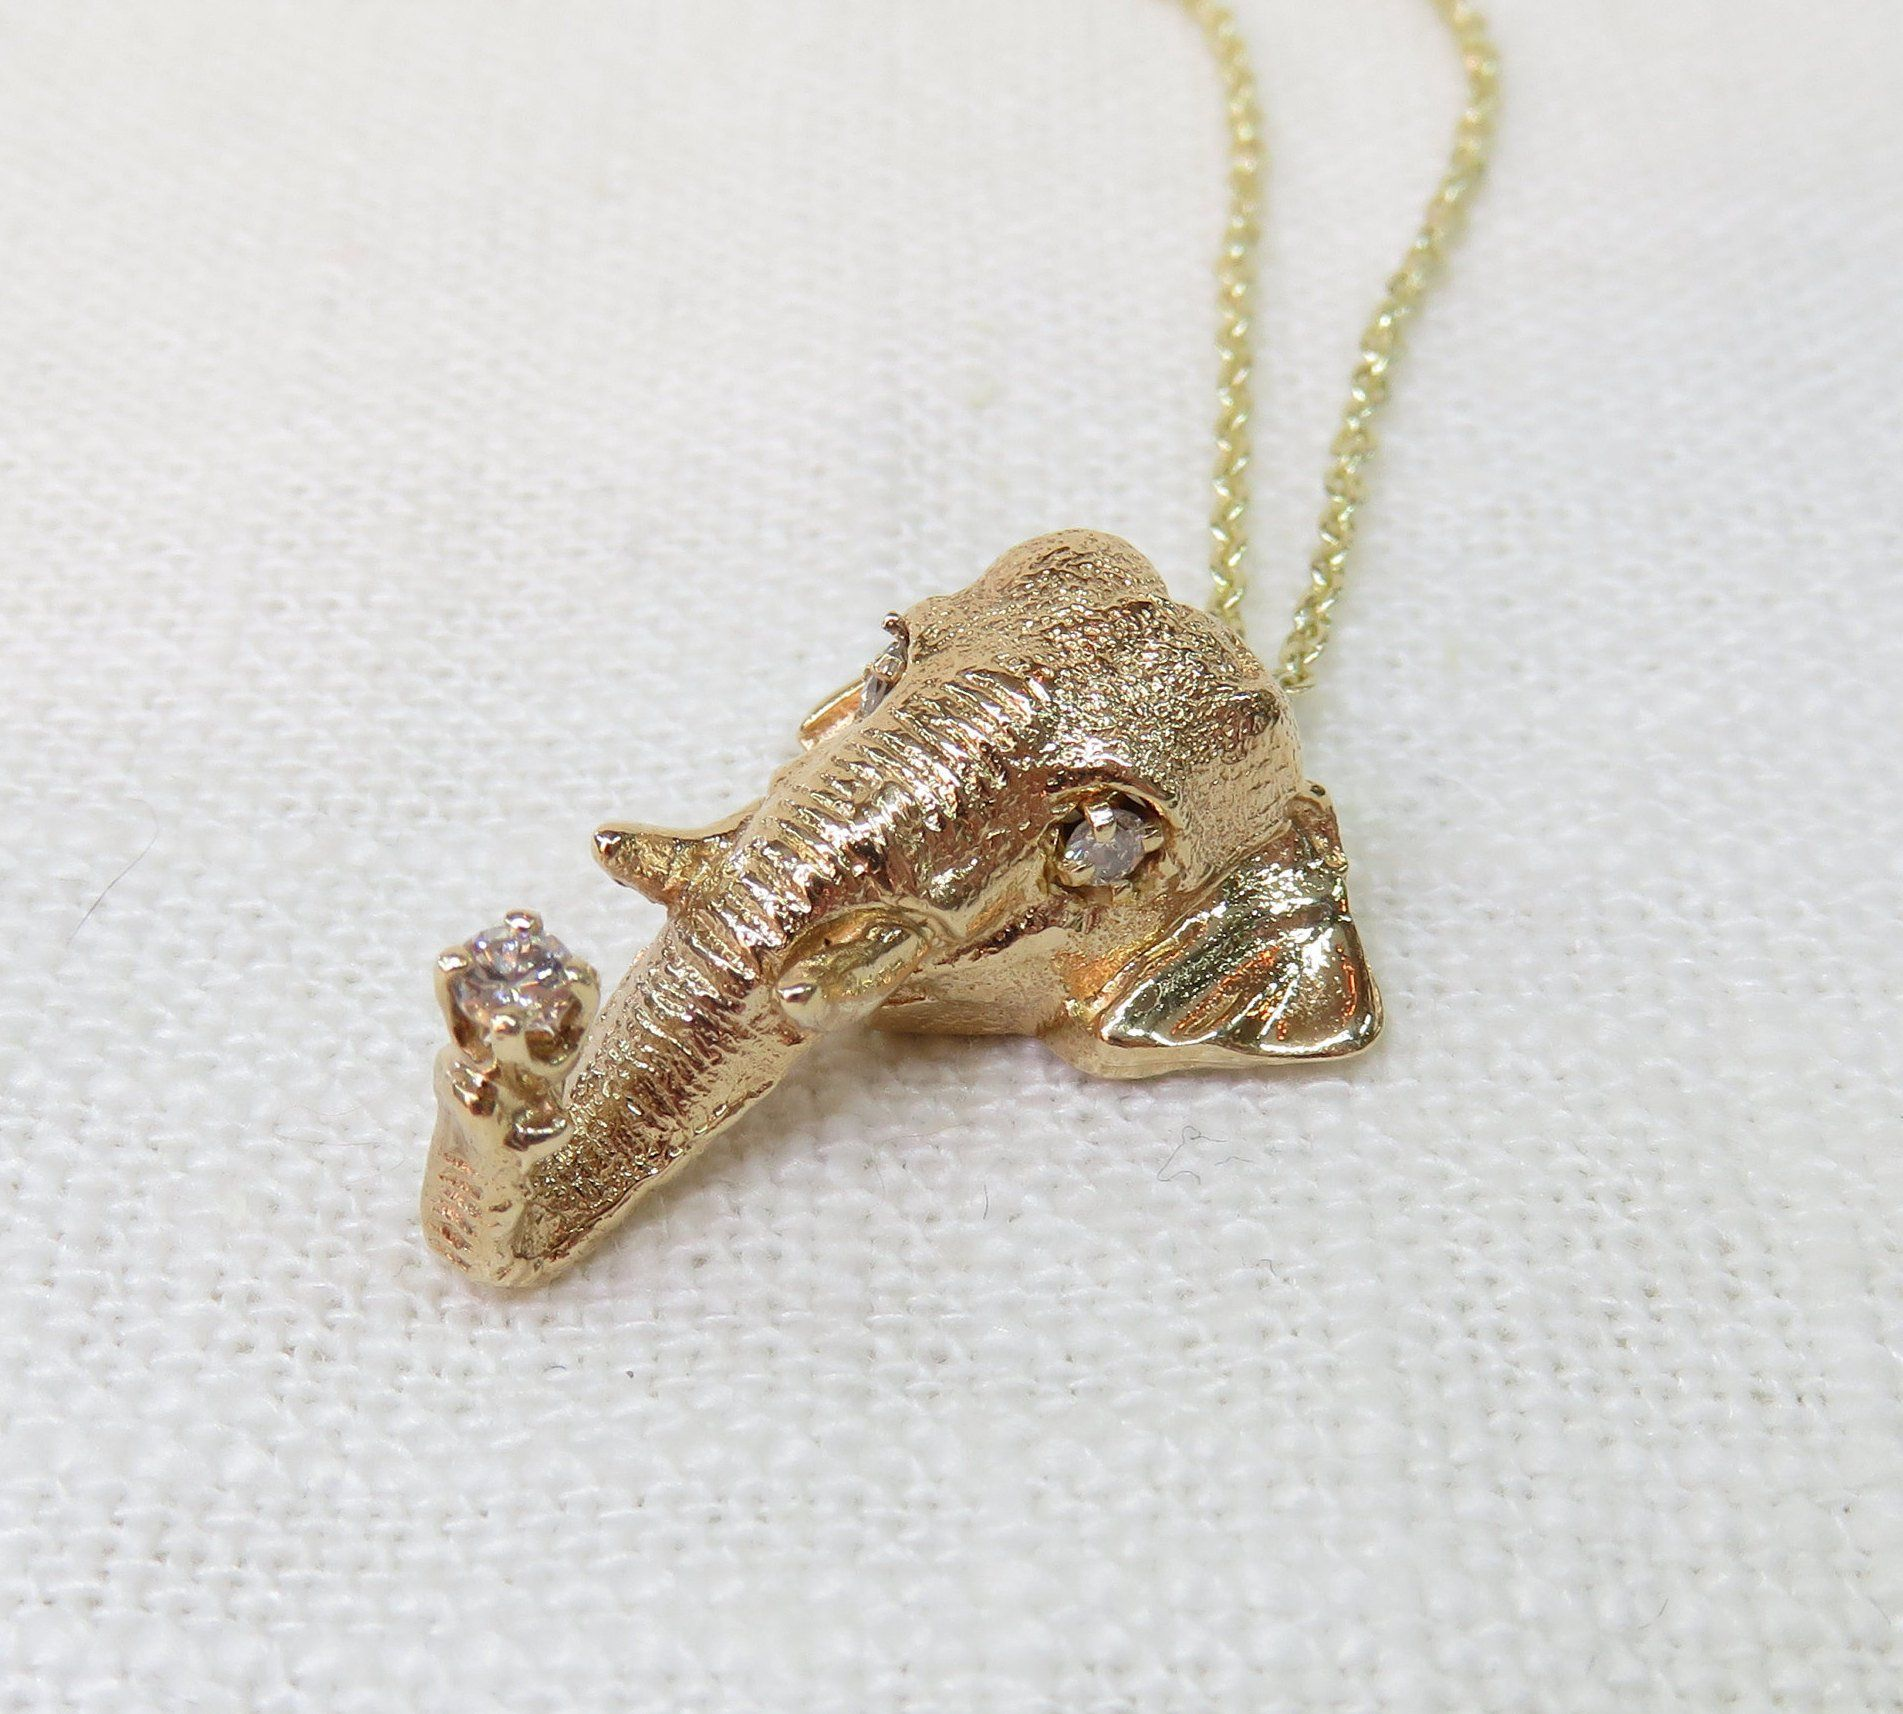 14k Gold And Diamond Elephant Pendant Necklace Vintage Necklace Elephant Necklace Vintage Elephant Pendant Necklace 14k Gold Ring Diamonds Elephant Pendant